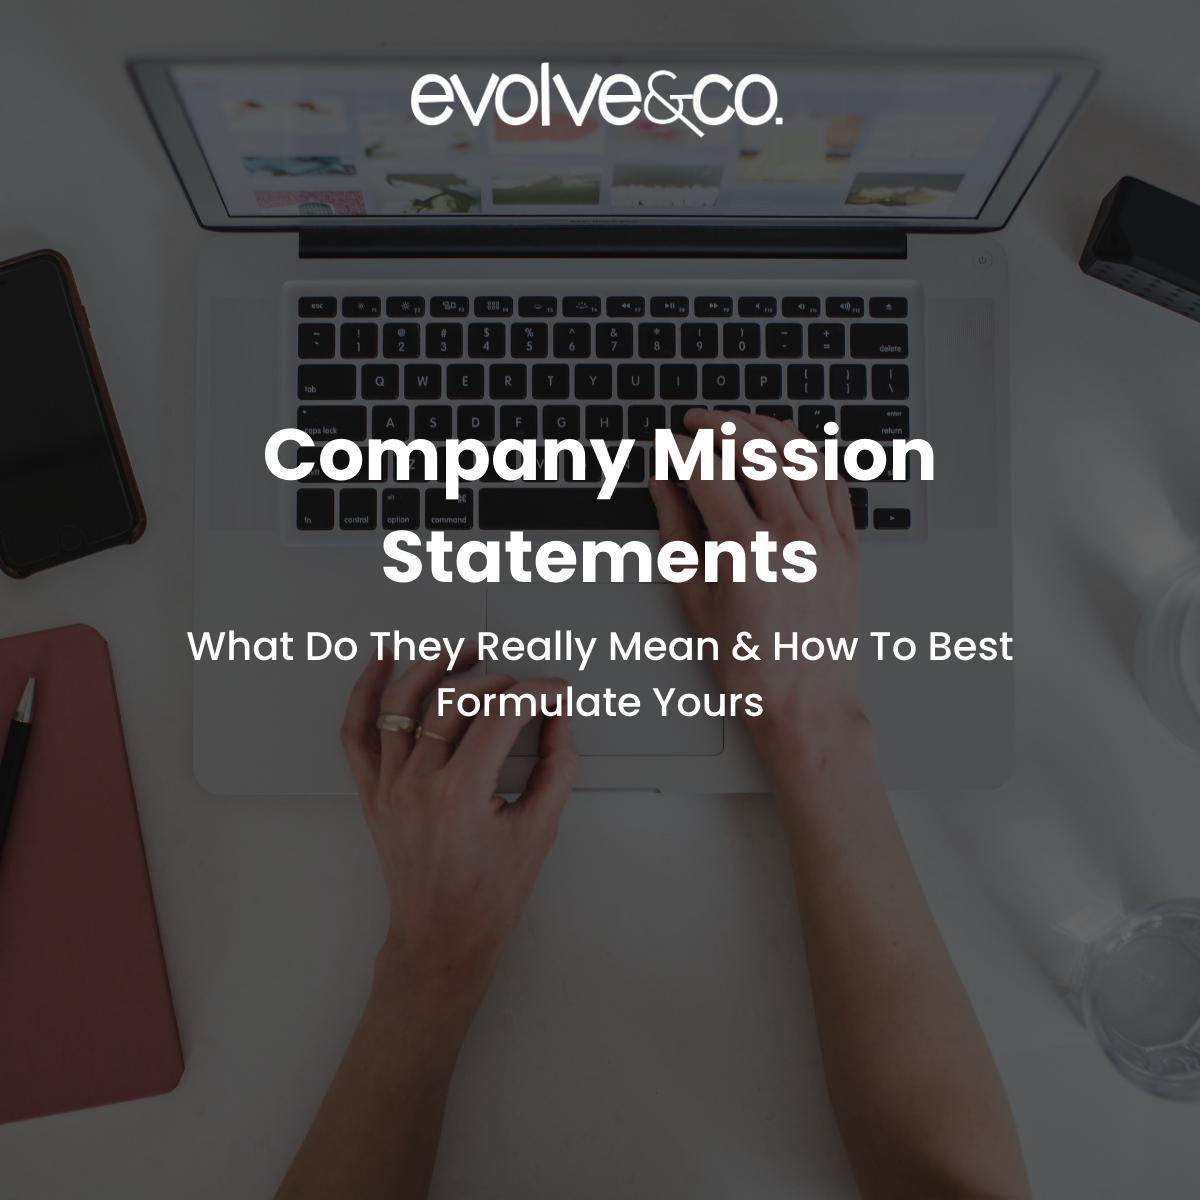 Company Mission Statements